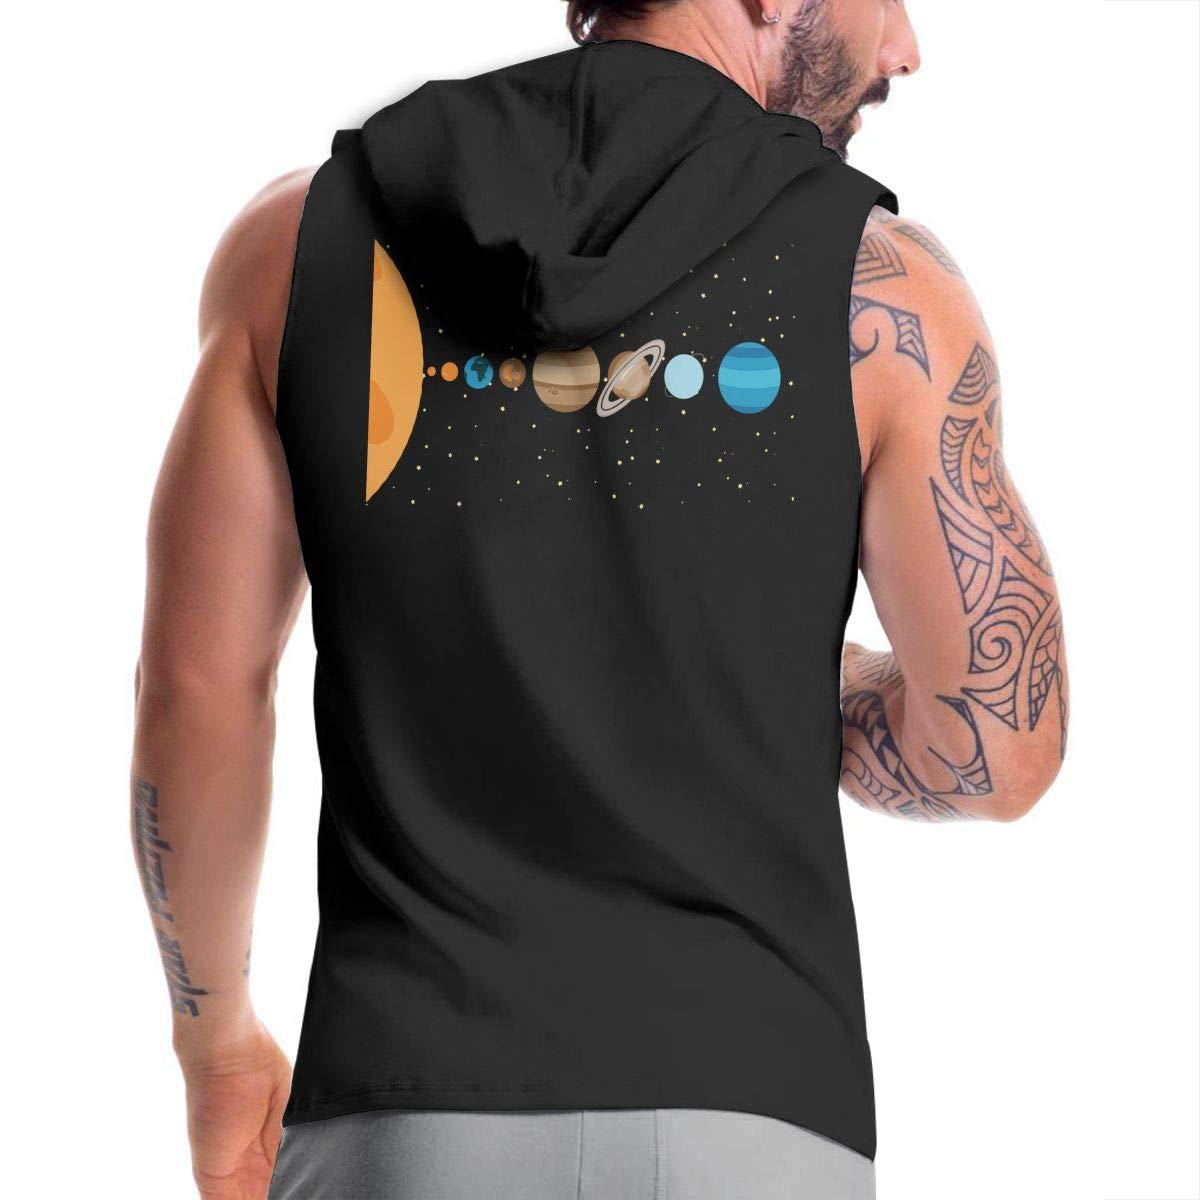 BMWEITIHBQ Mens Sleeveless Sweatshirt Solar System Galaxy Zipper Tank Tops